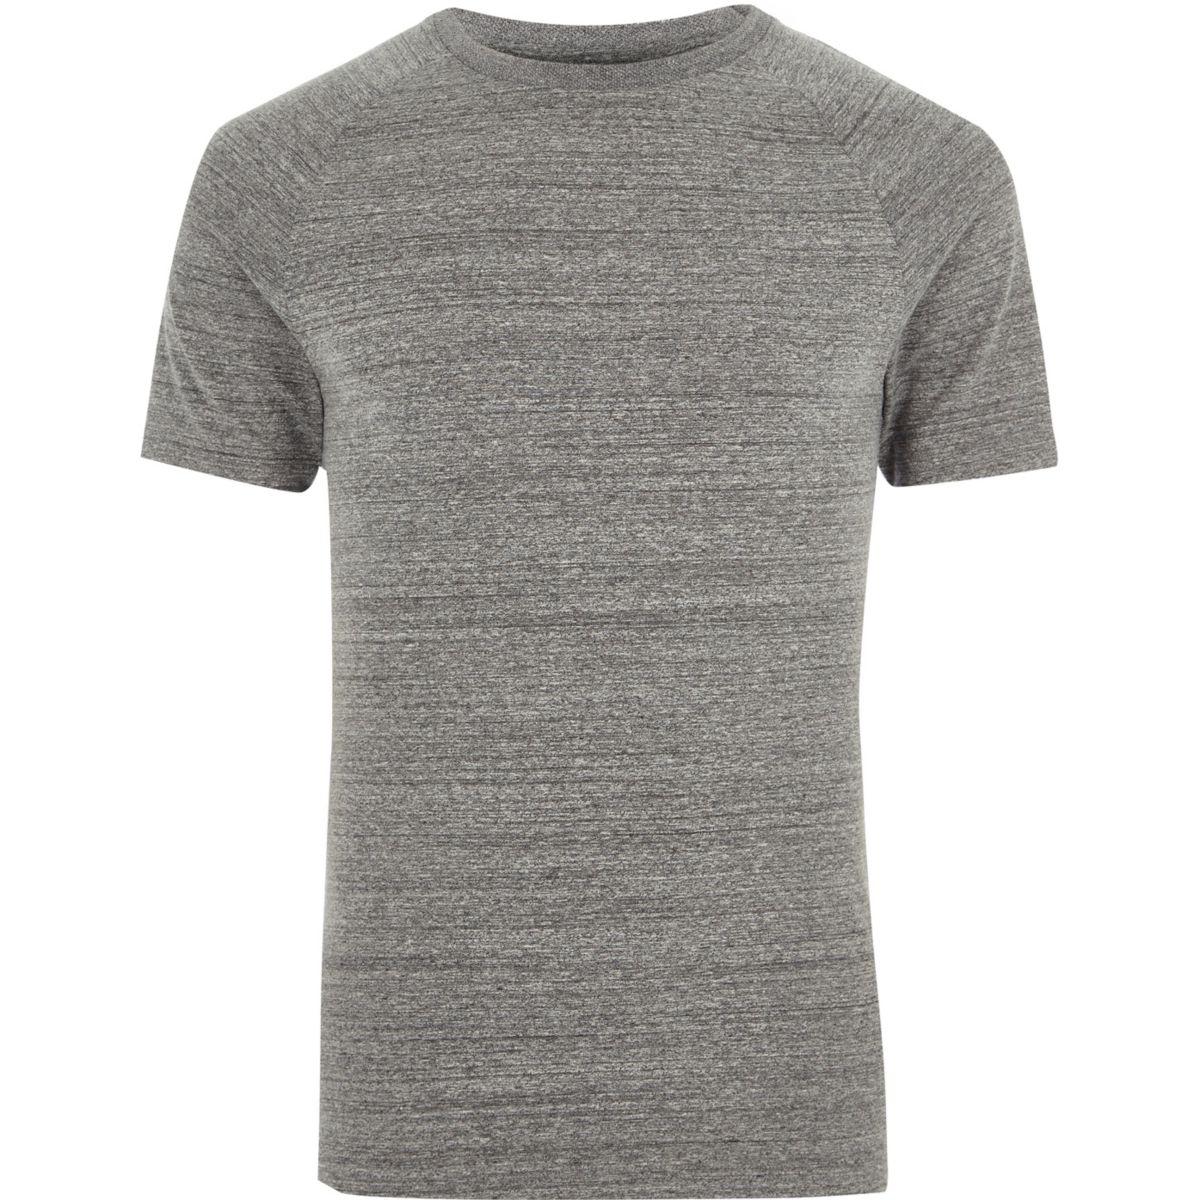 Grey marl muscle fit raglan T-shirt